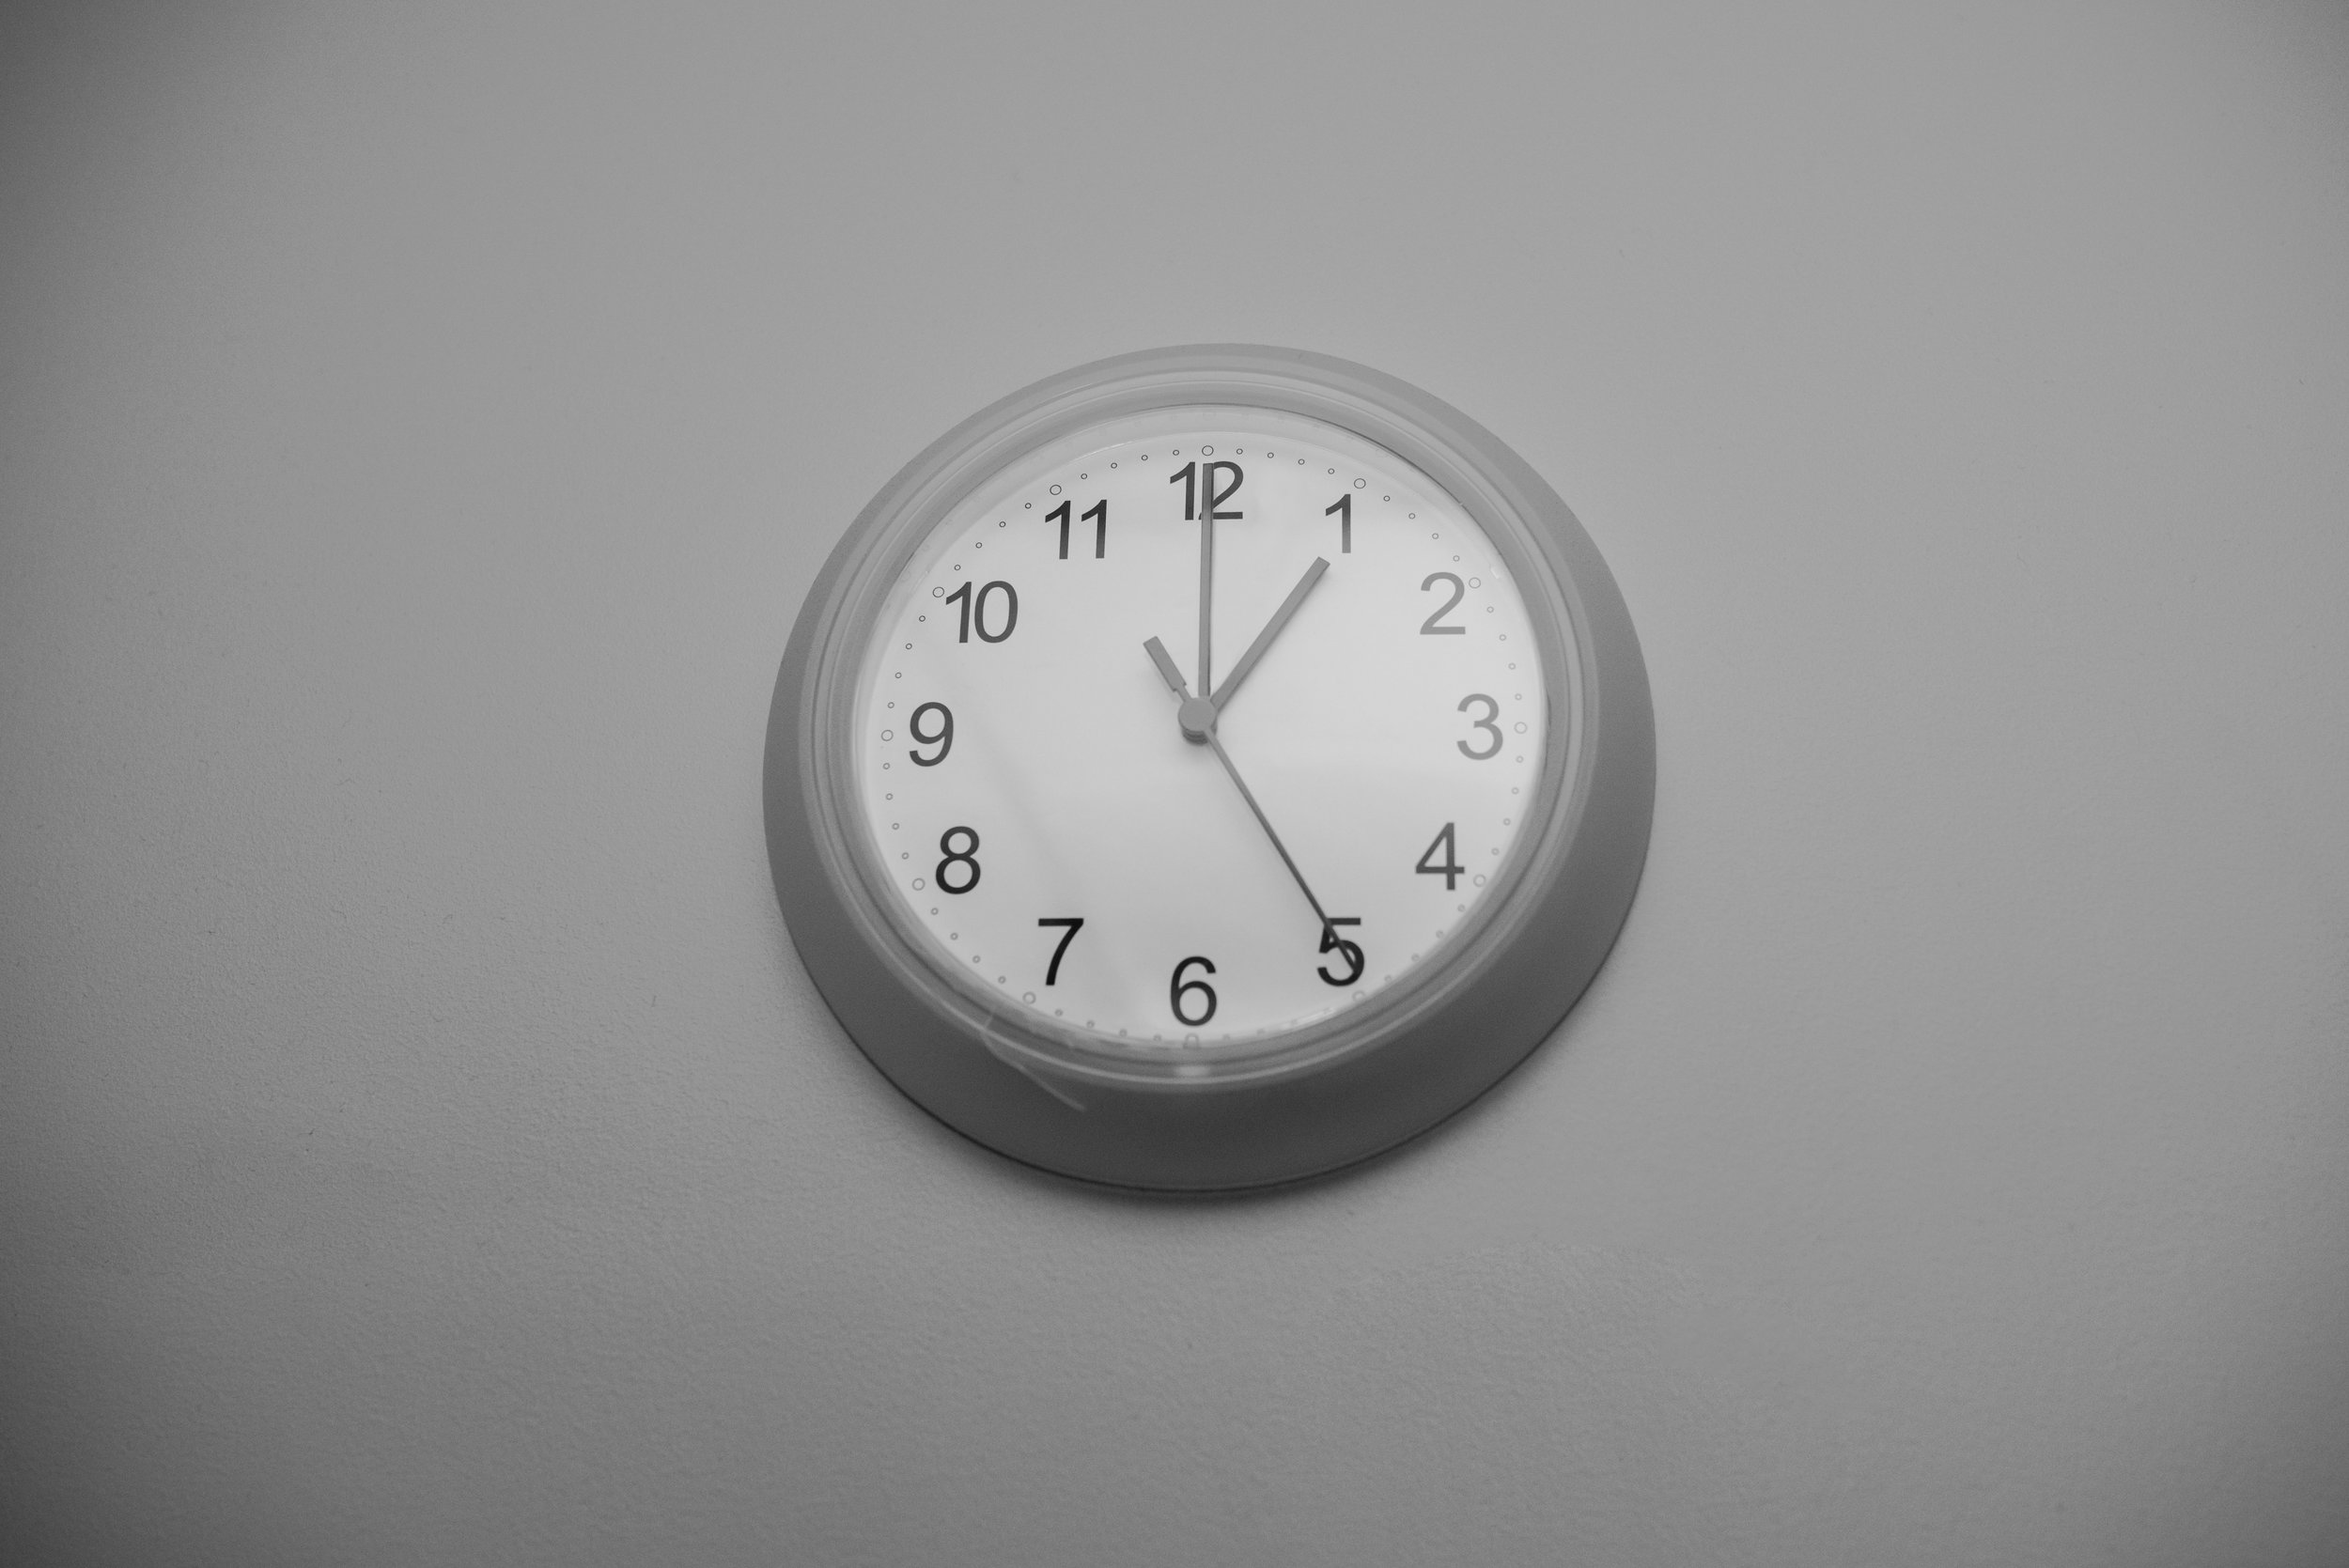 time-of-birth-waterbirth-jacksonville-duval-uf-birth-center